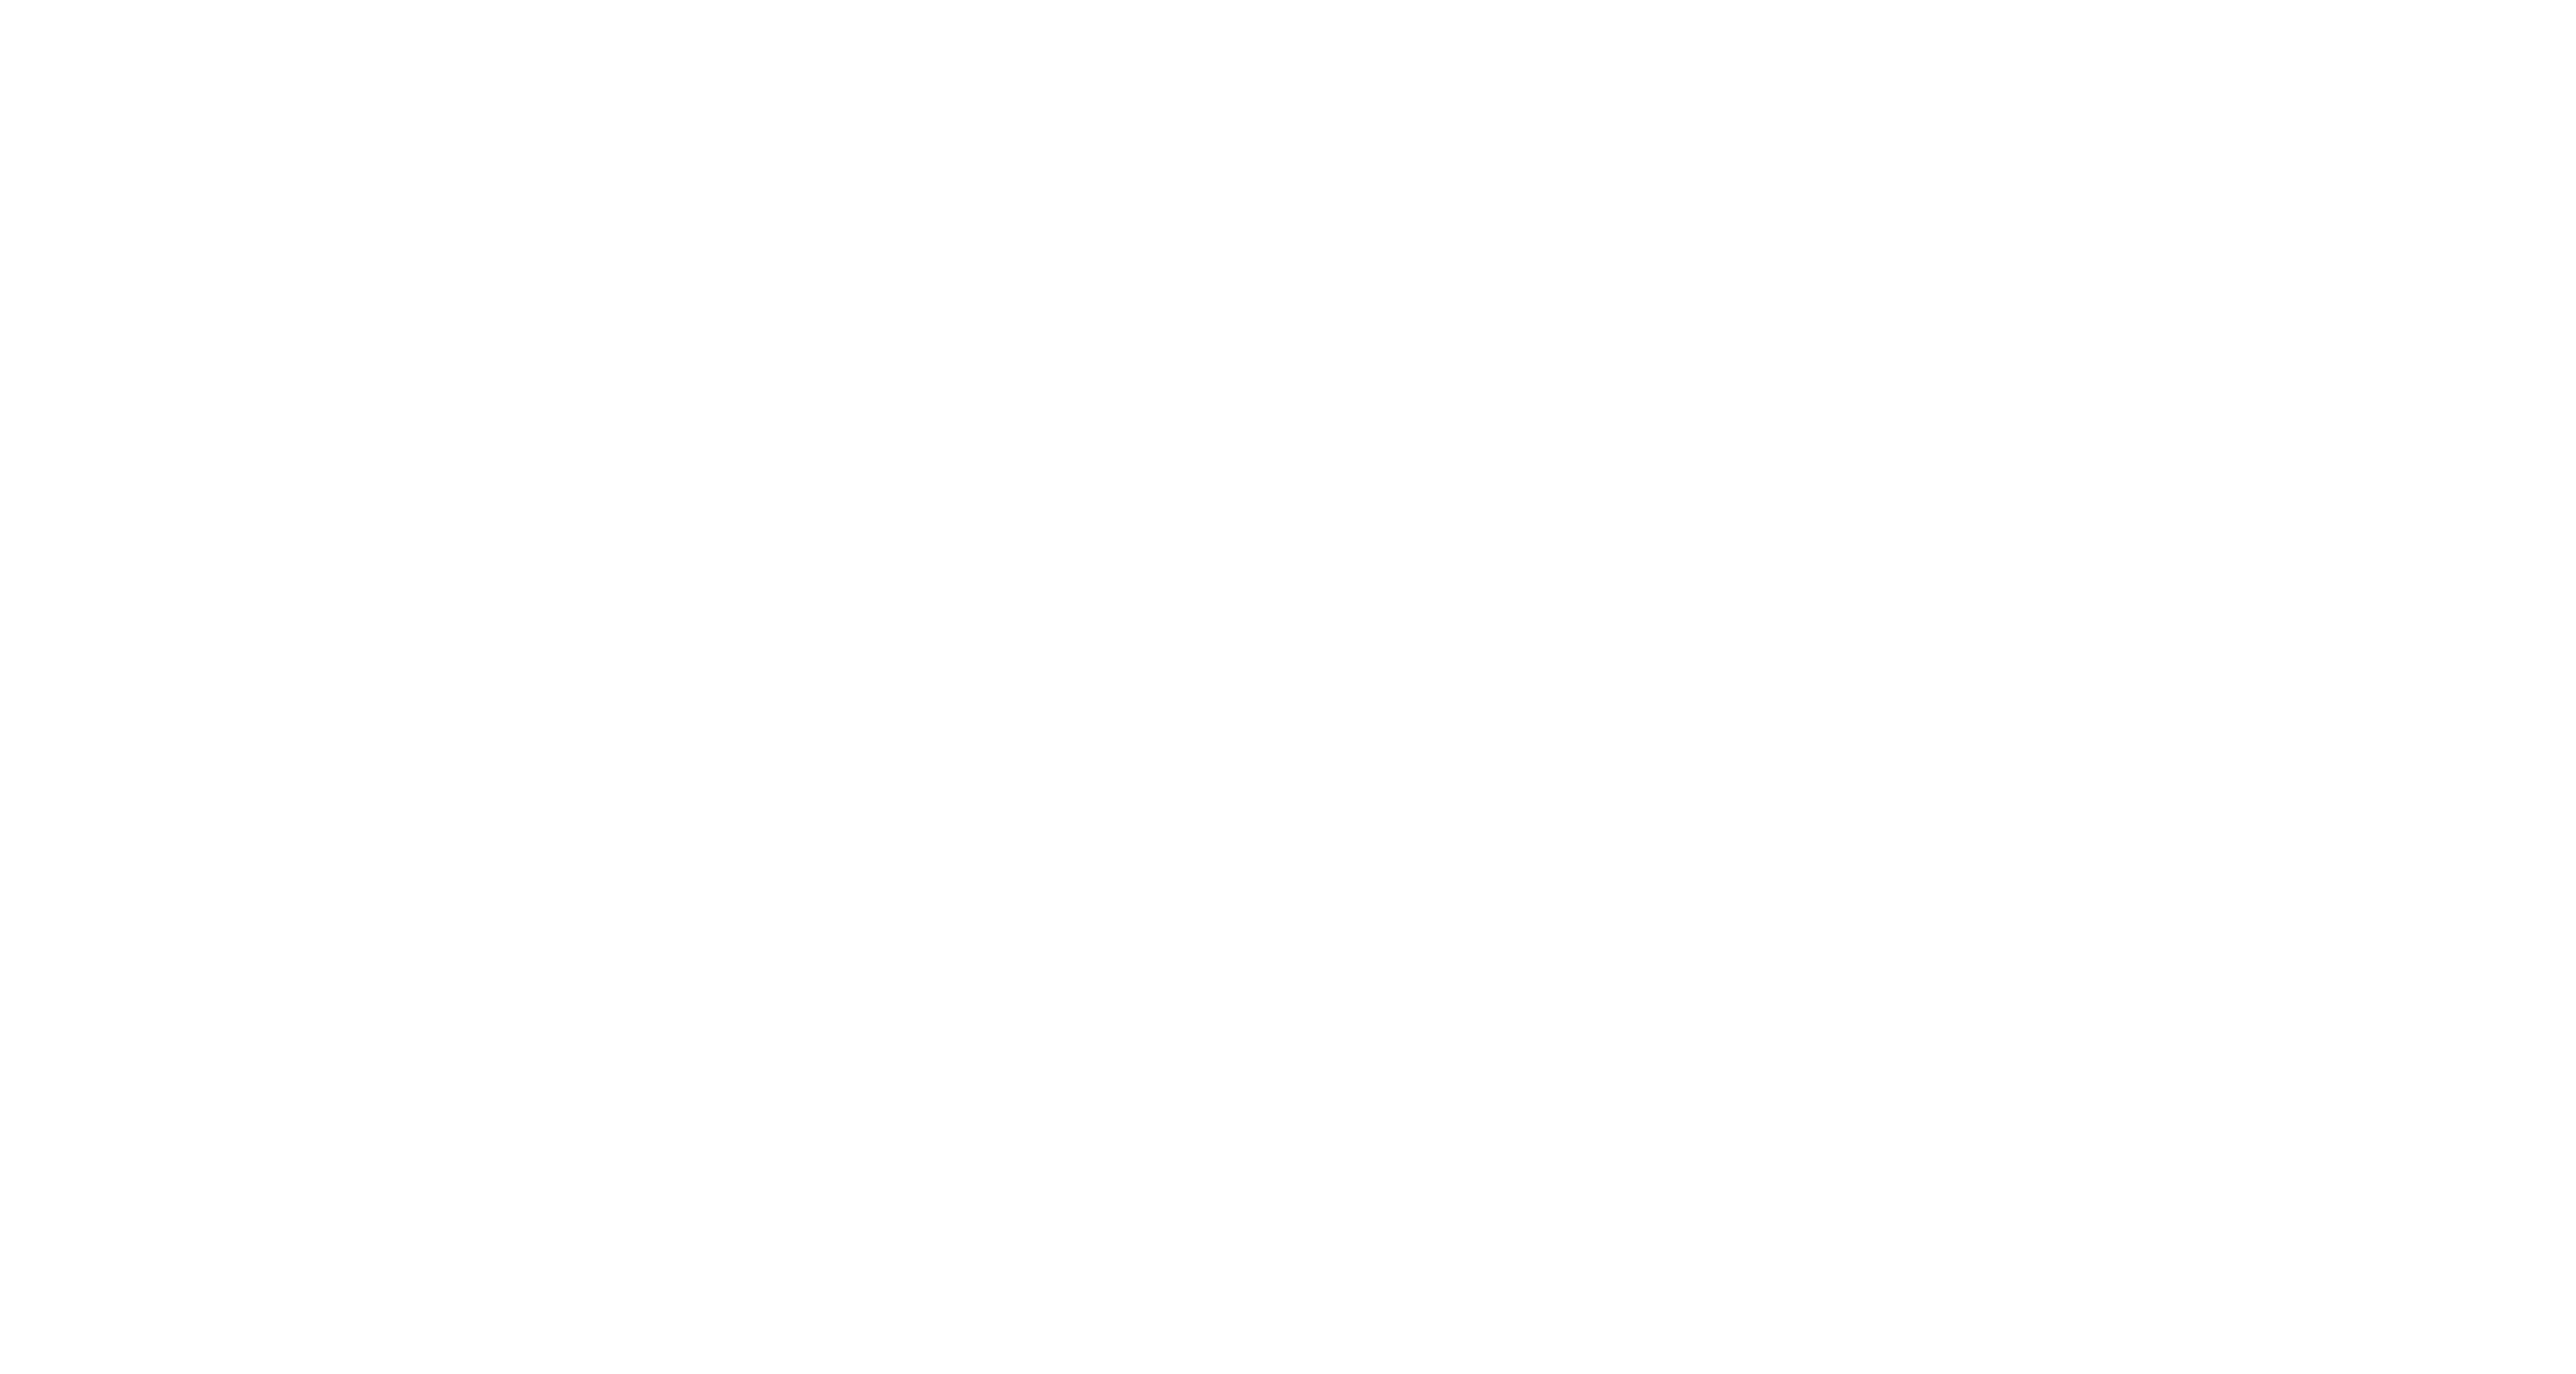 Stellagraphy